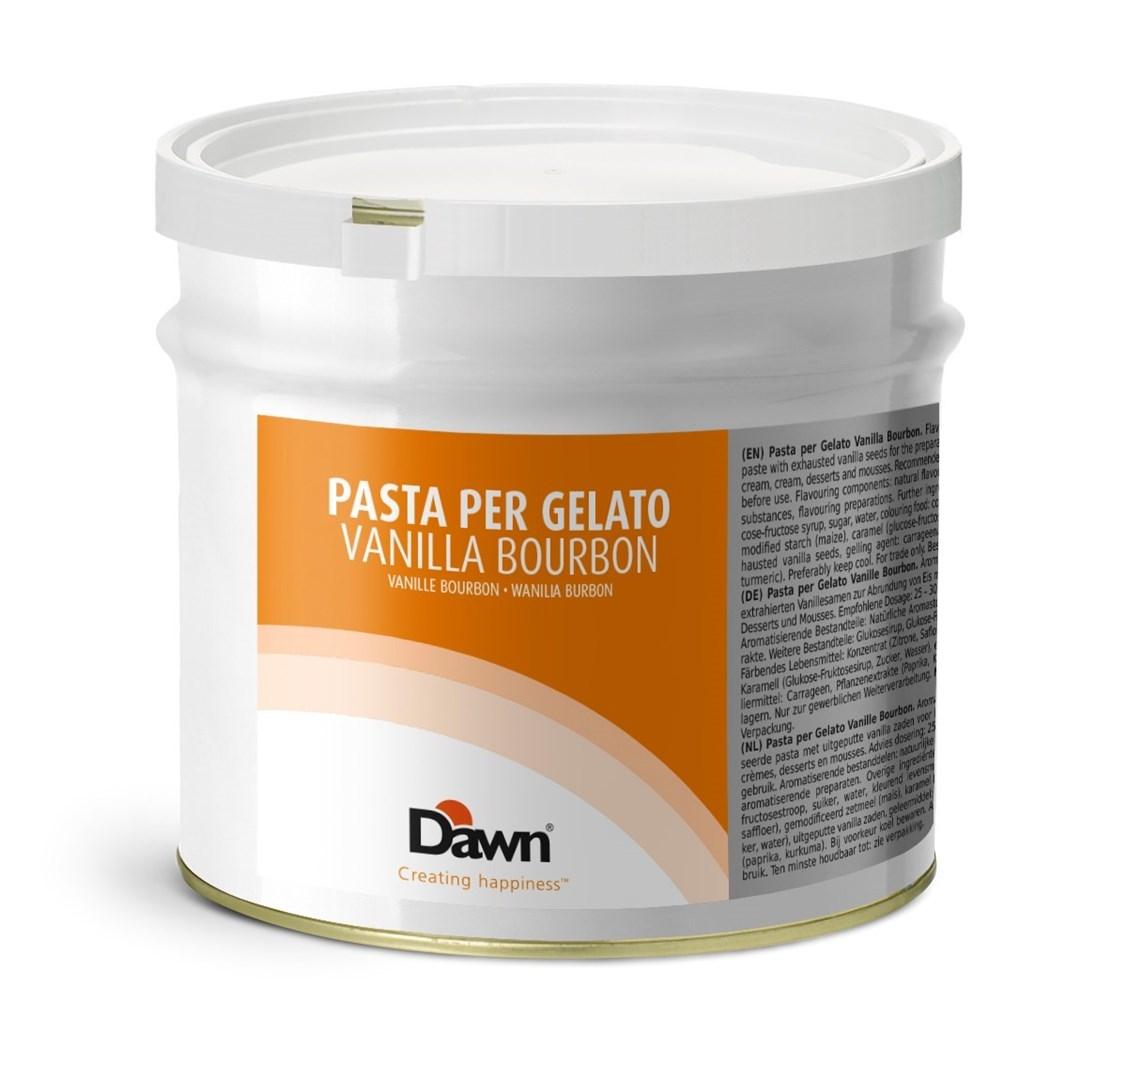 Productafbeelding Dawn Pasta Per Gelato Vanille Bourbon 3,5 kg blik